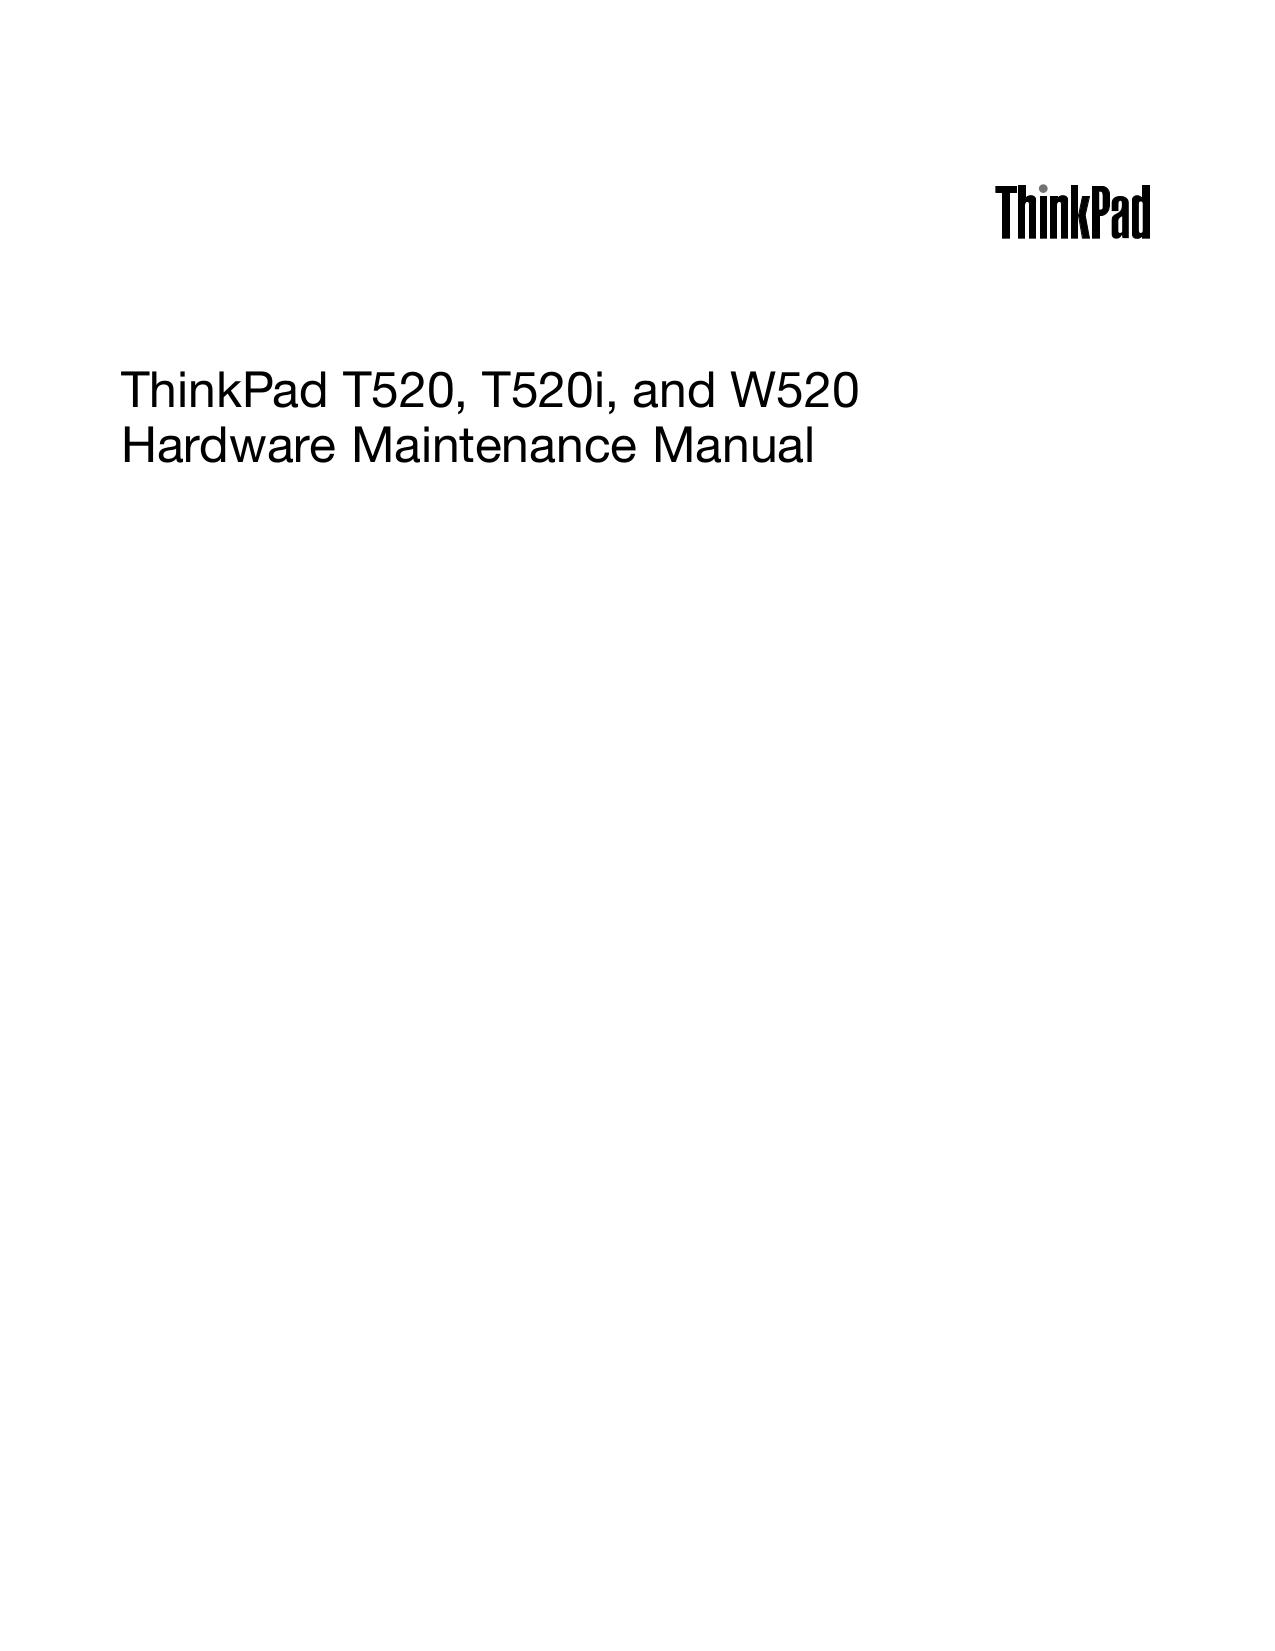 pdf for Lenovo Laptop ThinkPad W520 4276 manual